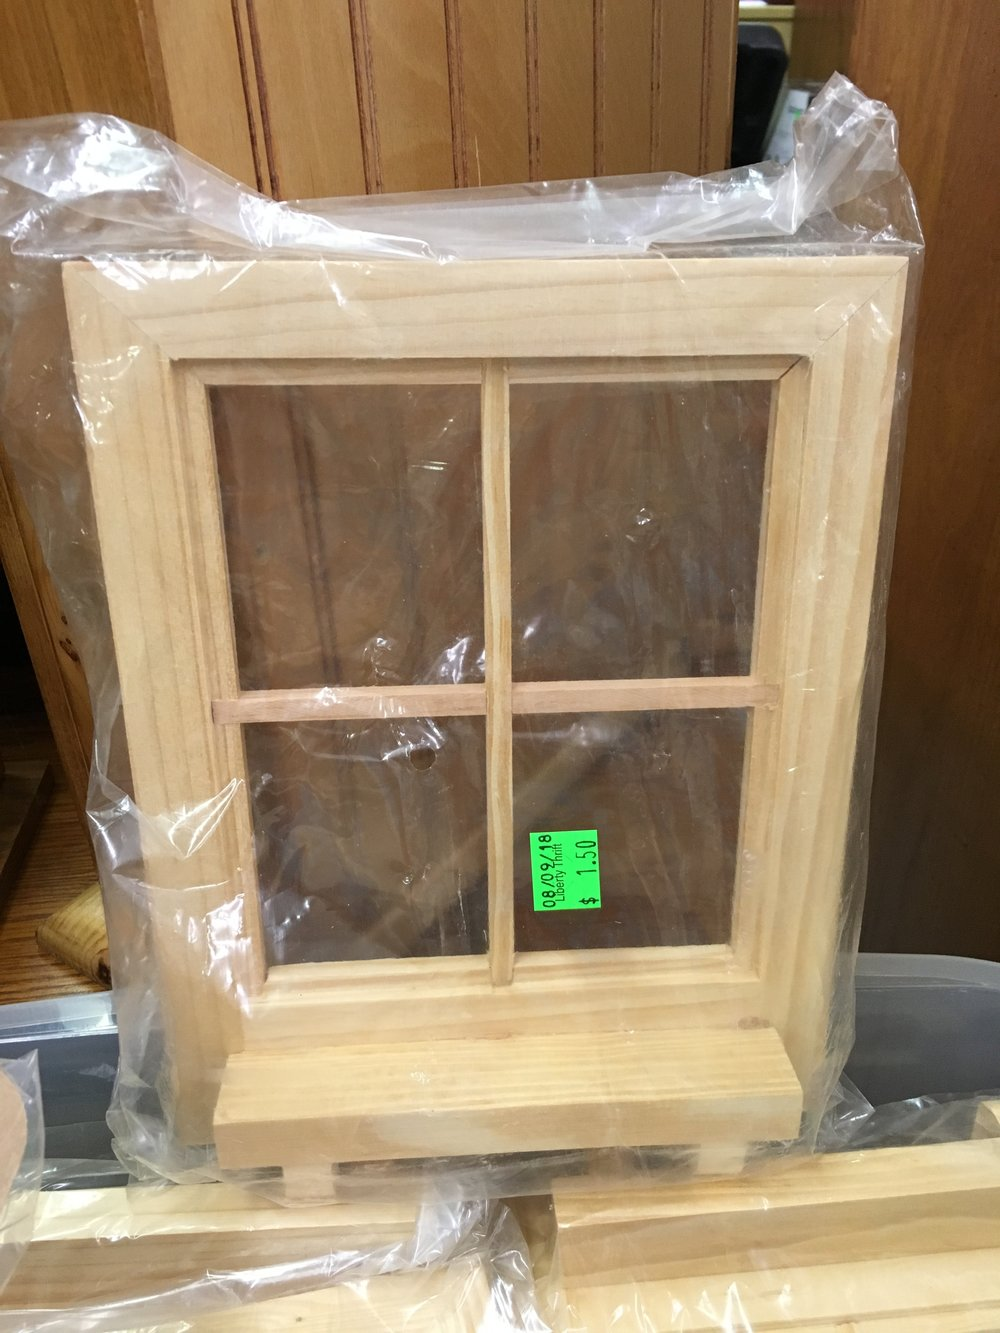 Window frame craft - sponsored by Kristin Johnson